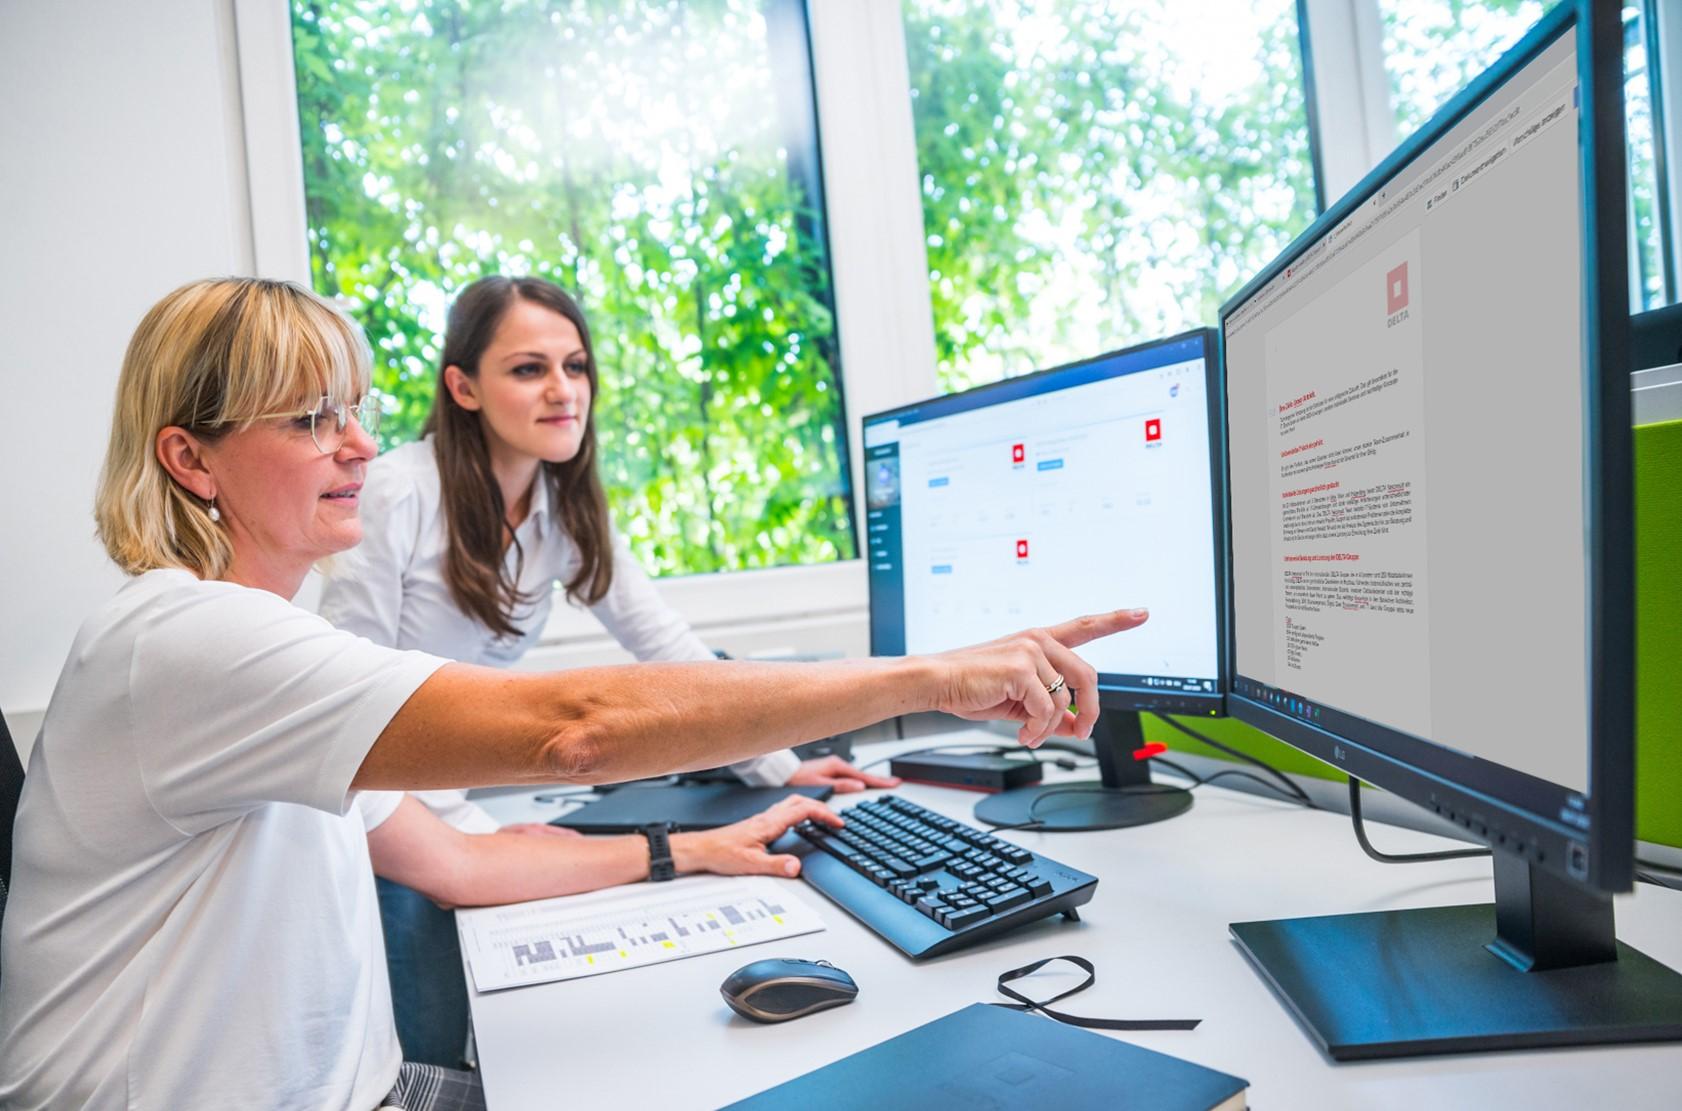 Arbeitsplatz_Datenpool_Onlinebearbeitung